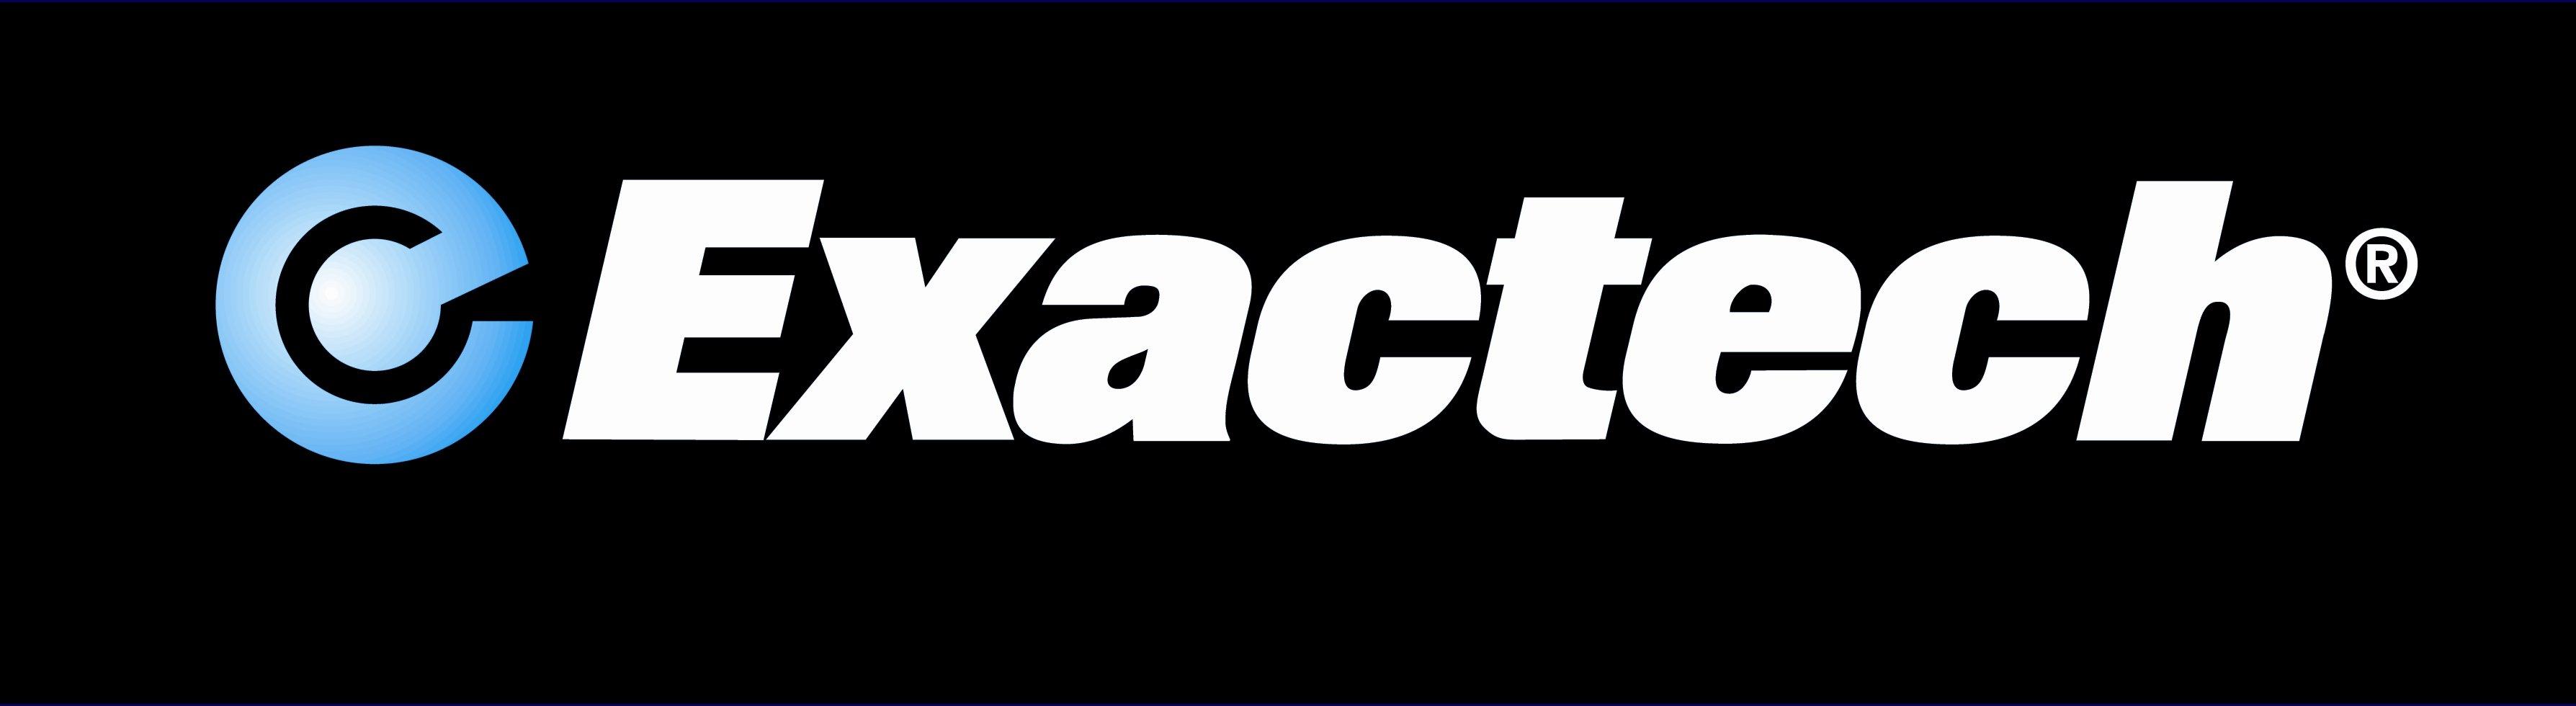 Exactech logo